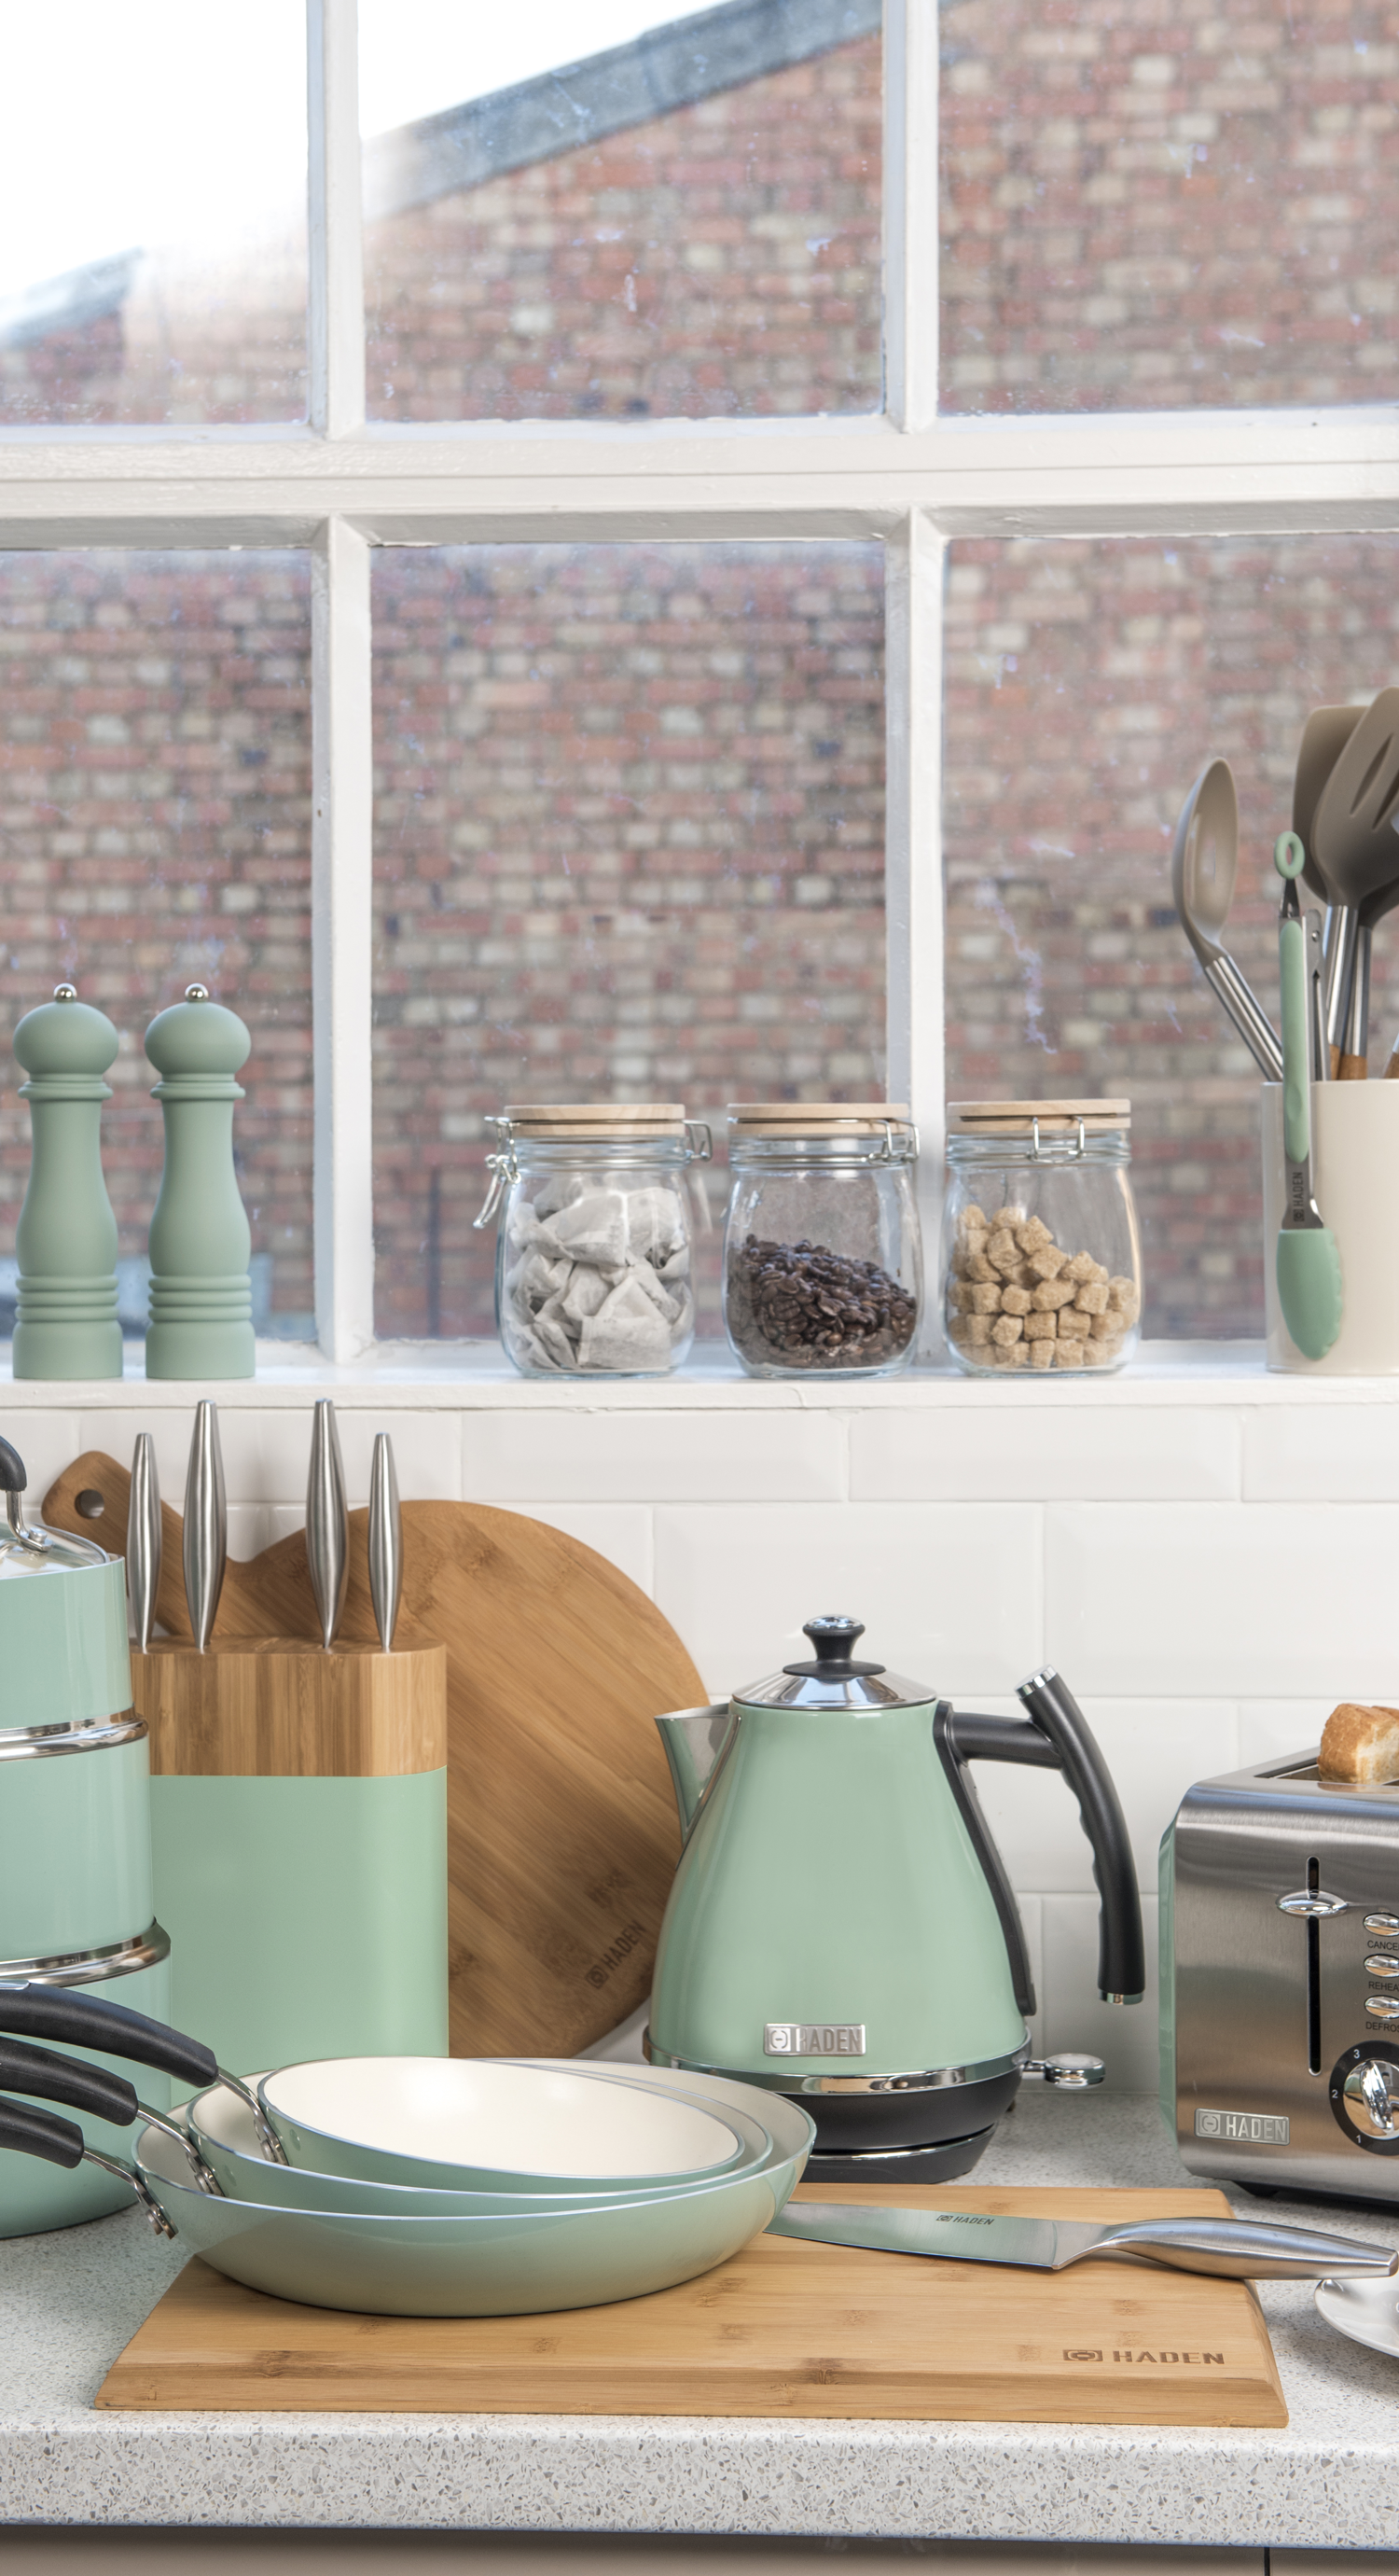 Sage coloured pastle kettle